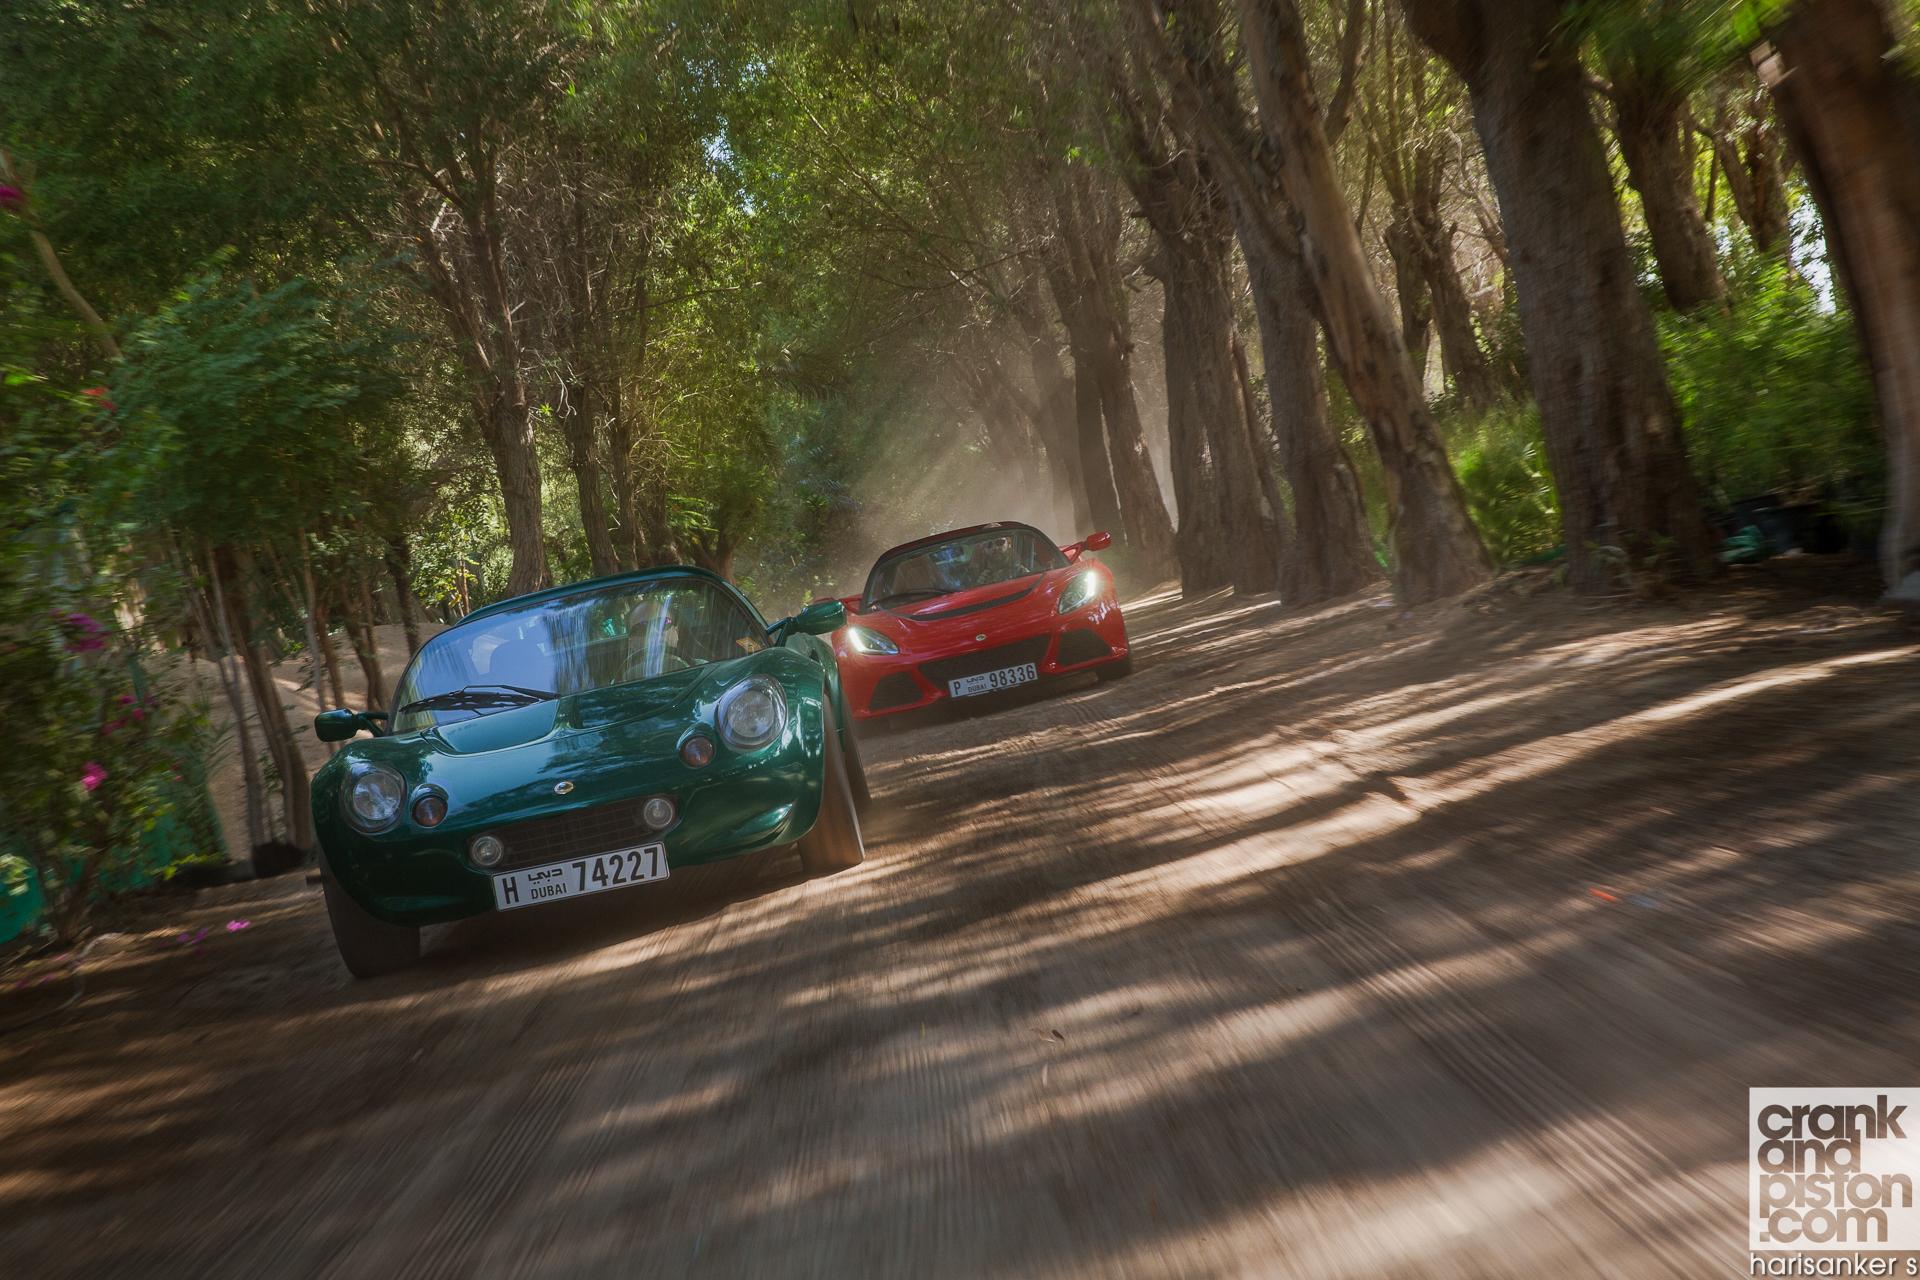 Lotus Elise 111S vs Lotus Exige S Roadster crankandpiston Wallpapers-7